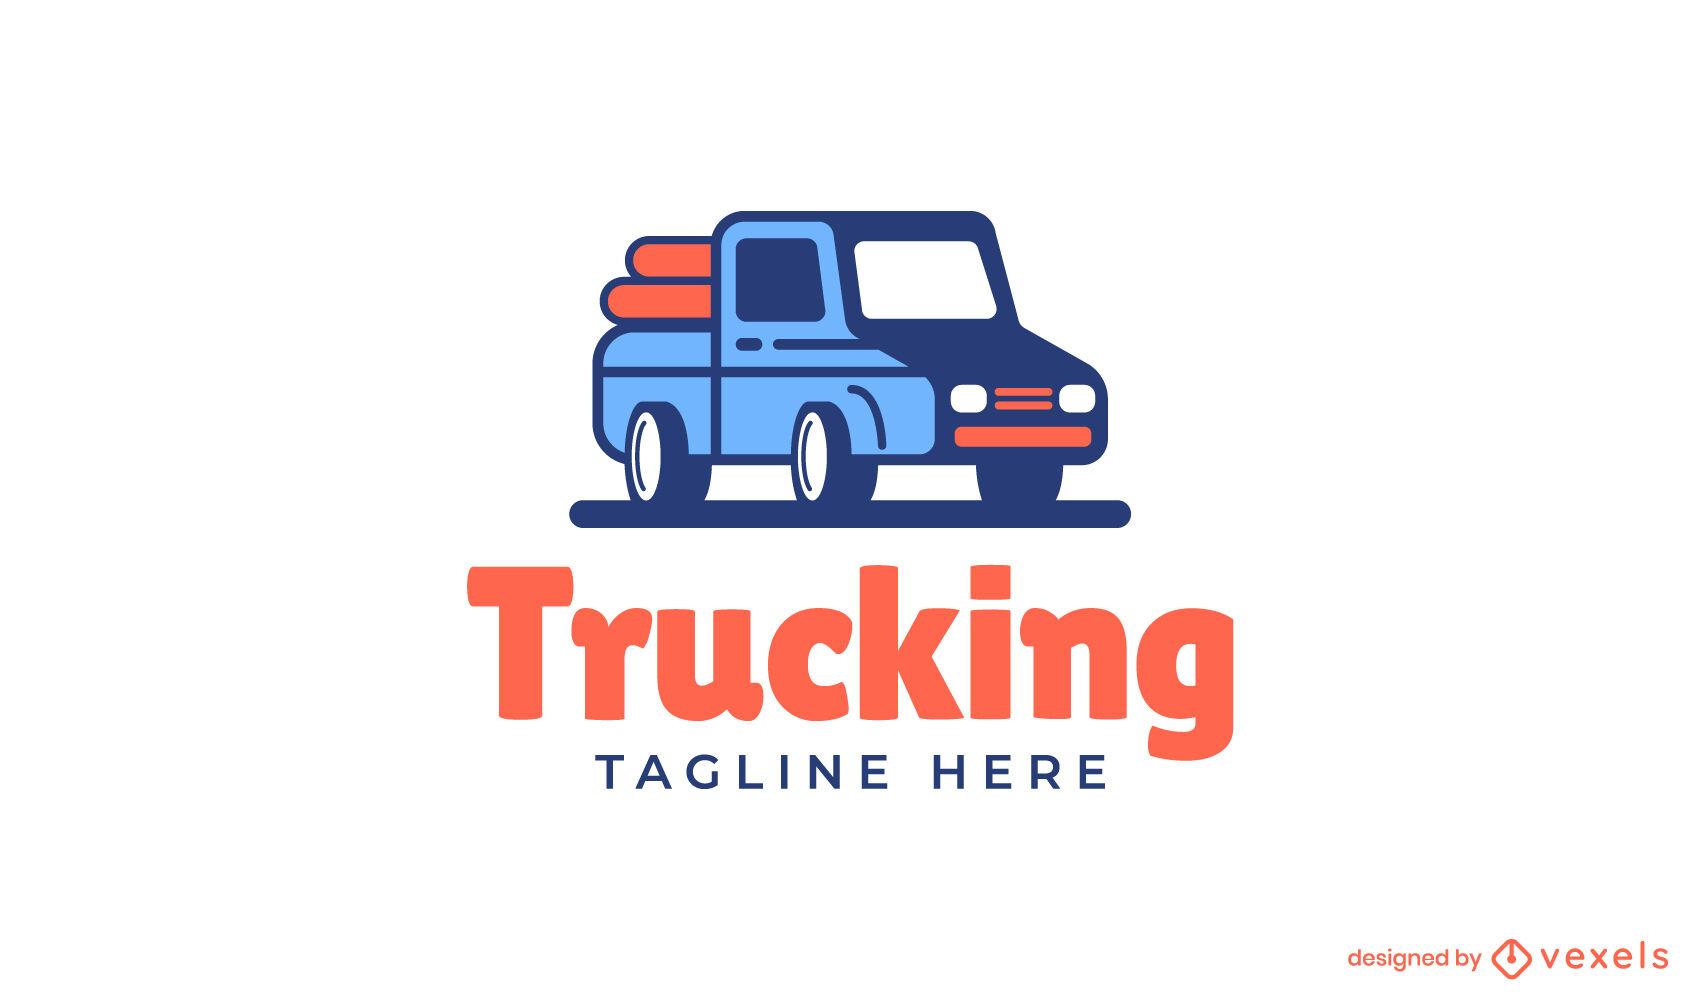 Truck transportation business logo design